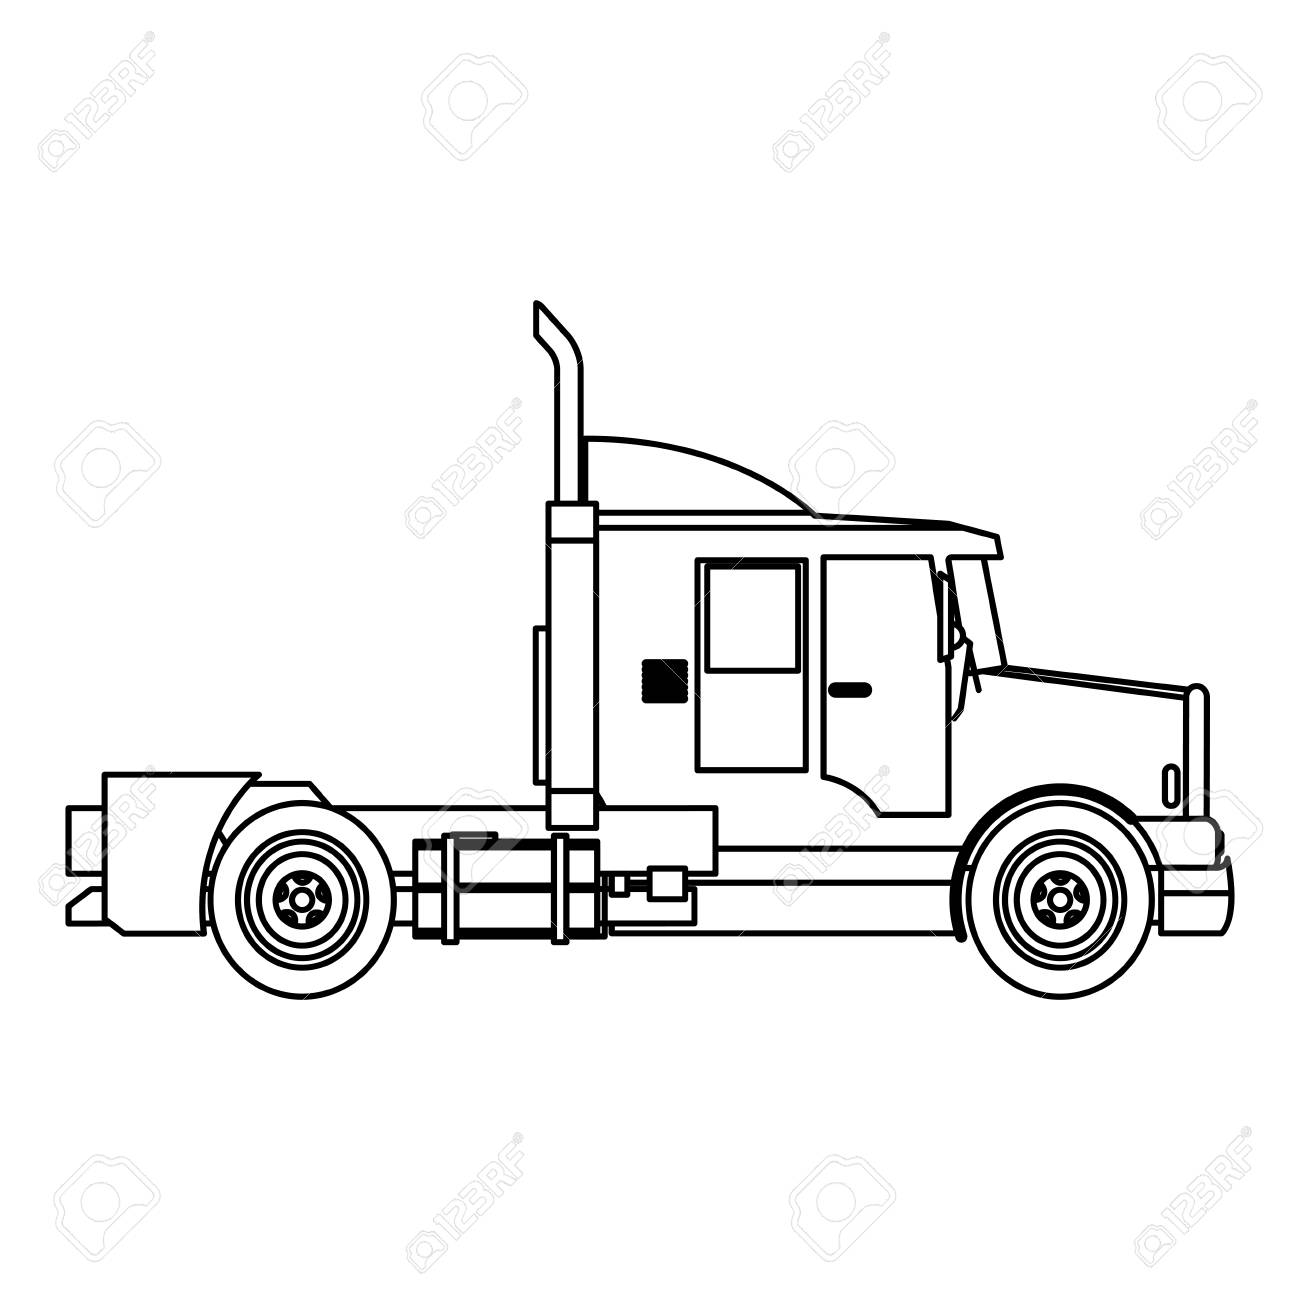 32 Tractor Trailer Pre Trip Inspection Diagram